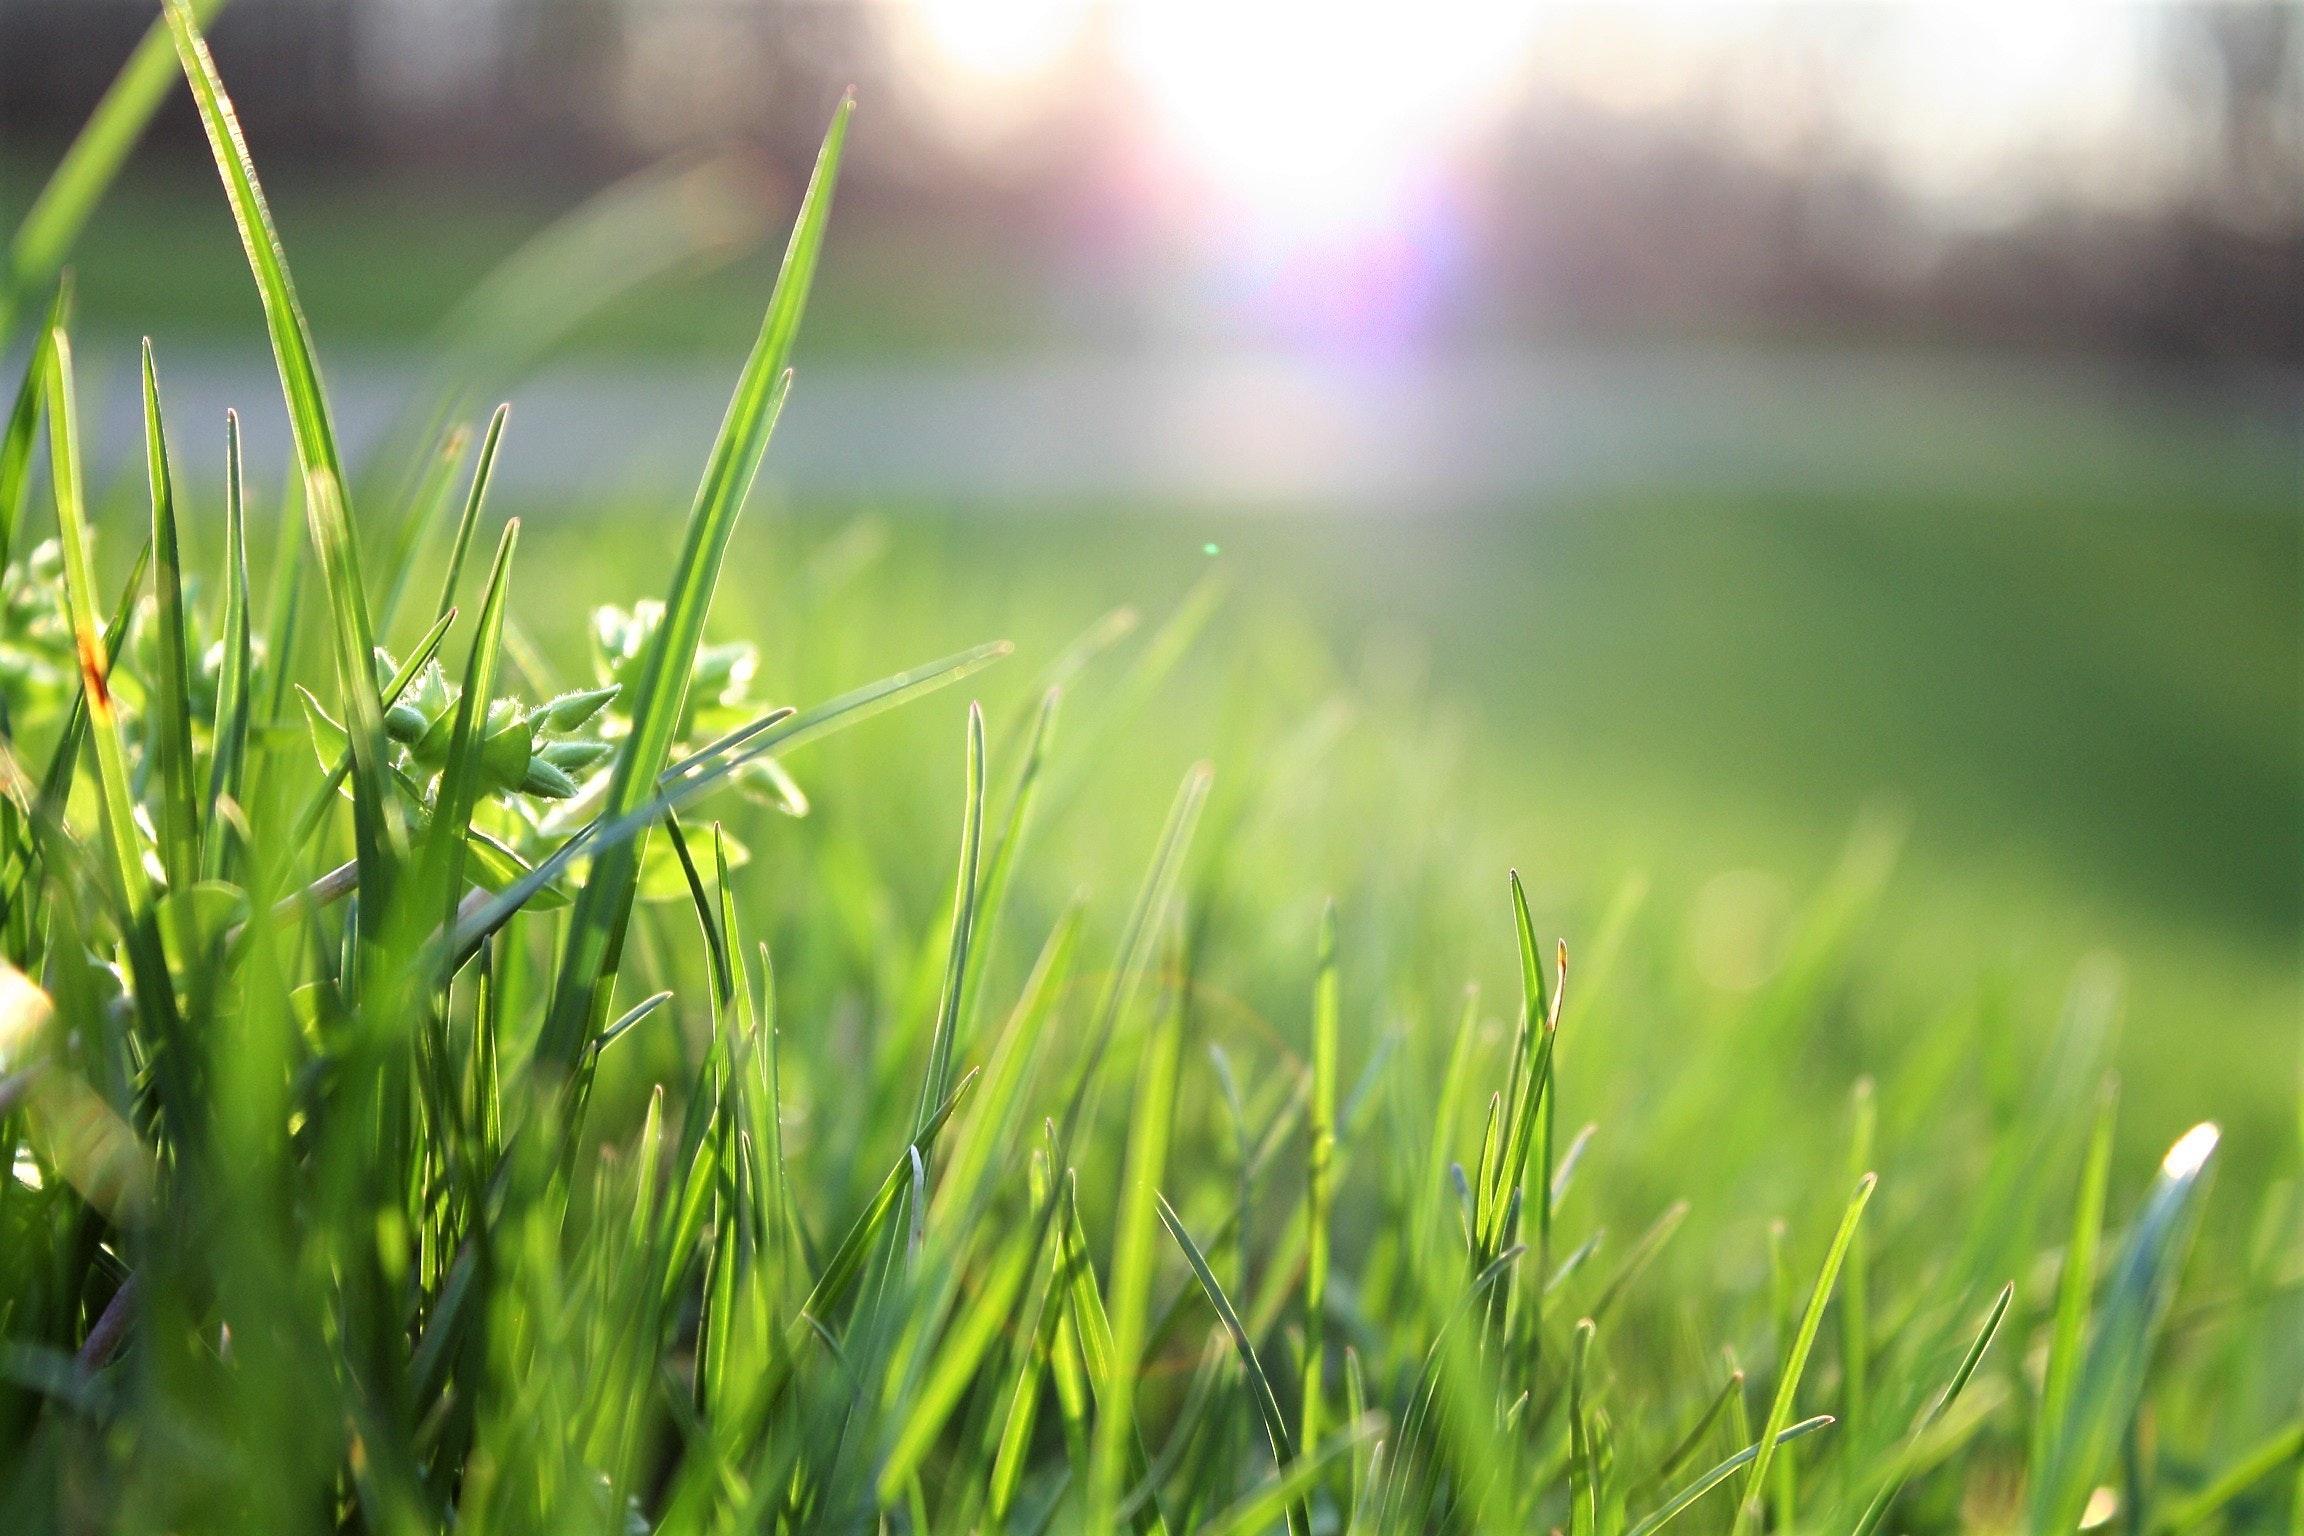 blade-of-grass-depth-of-field-environment-580900